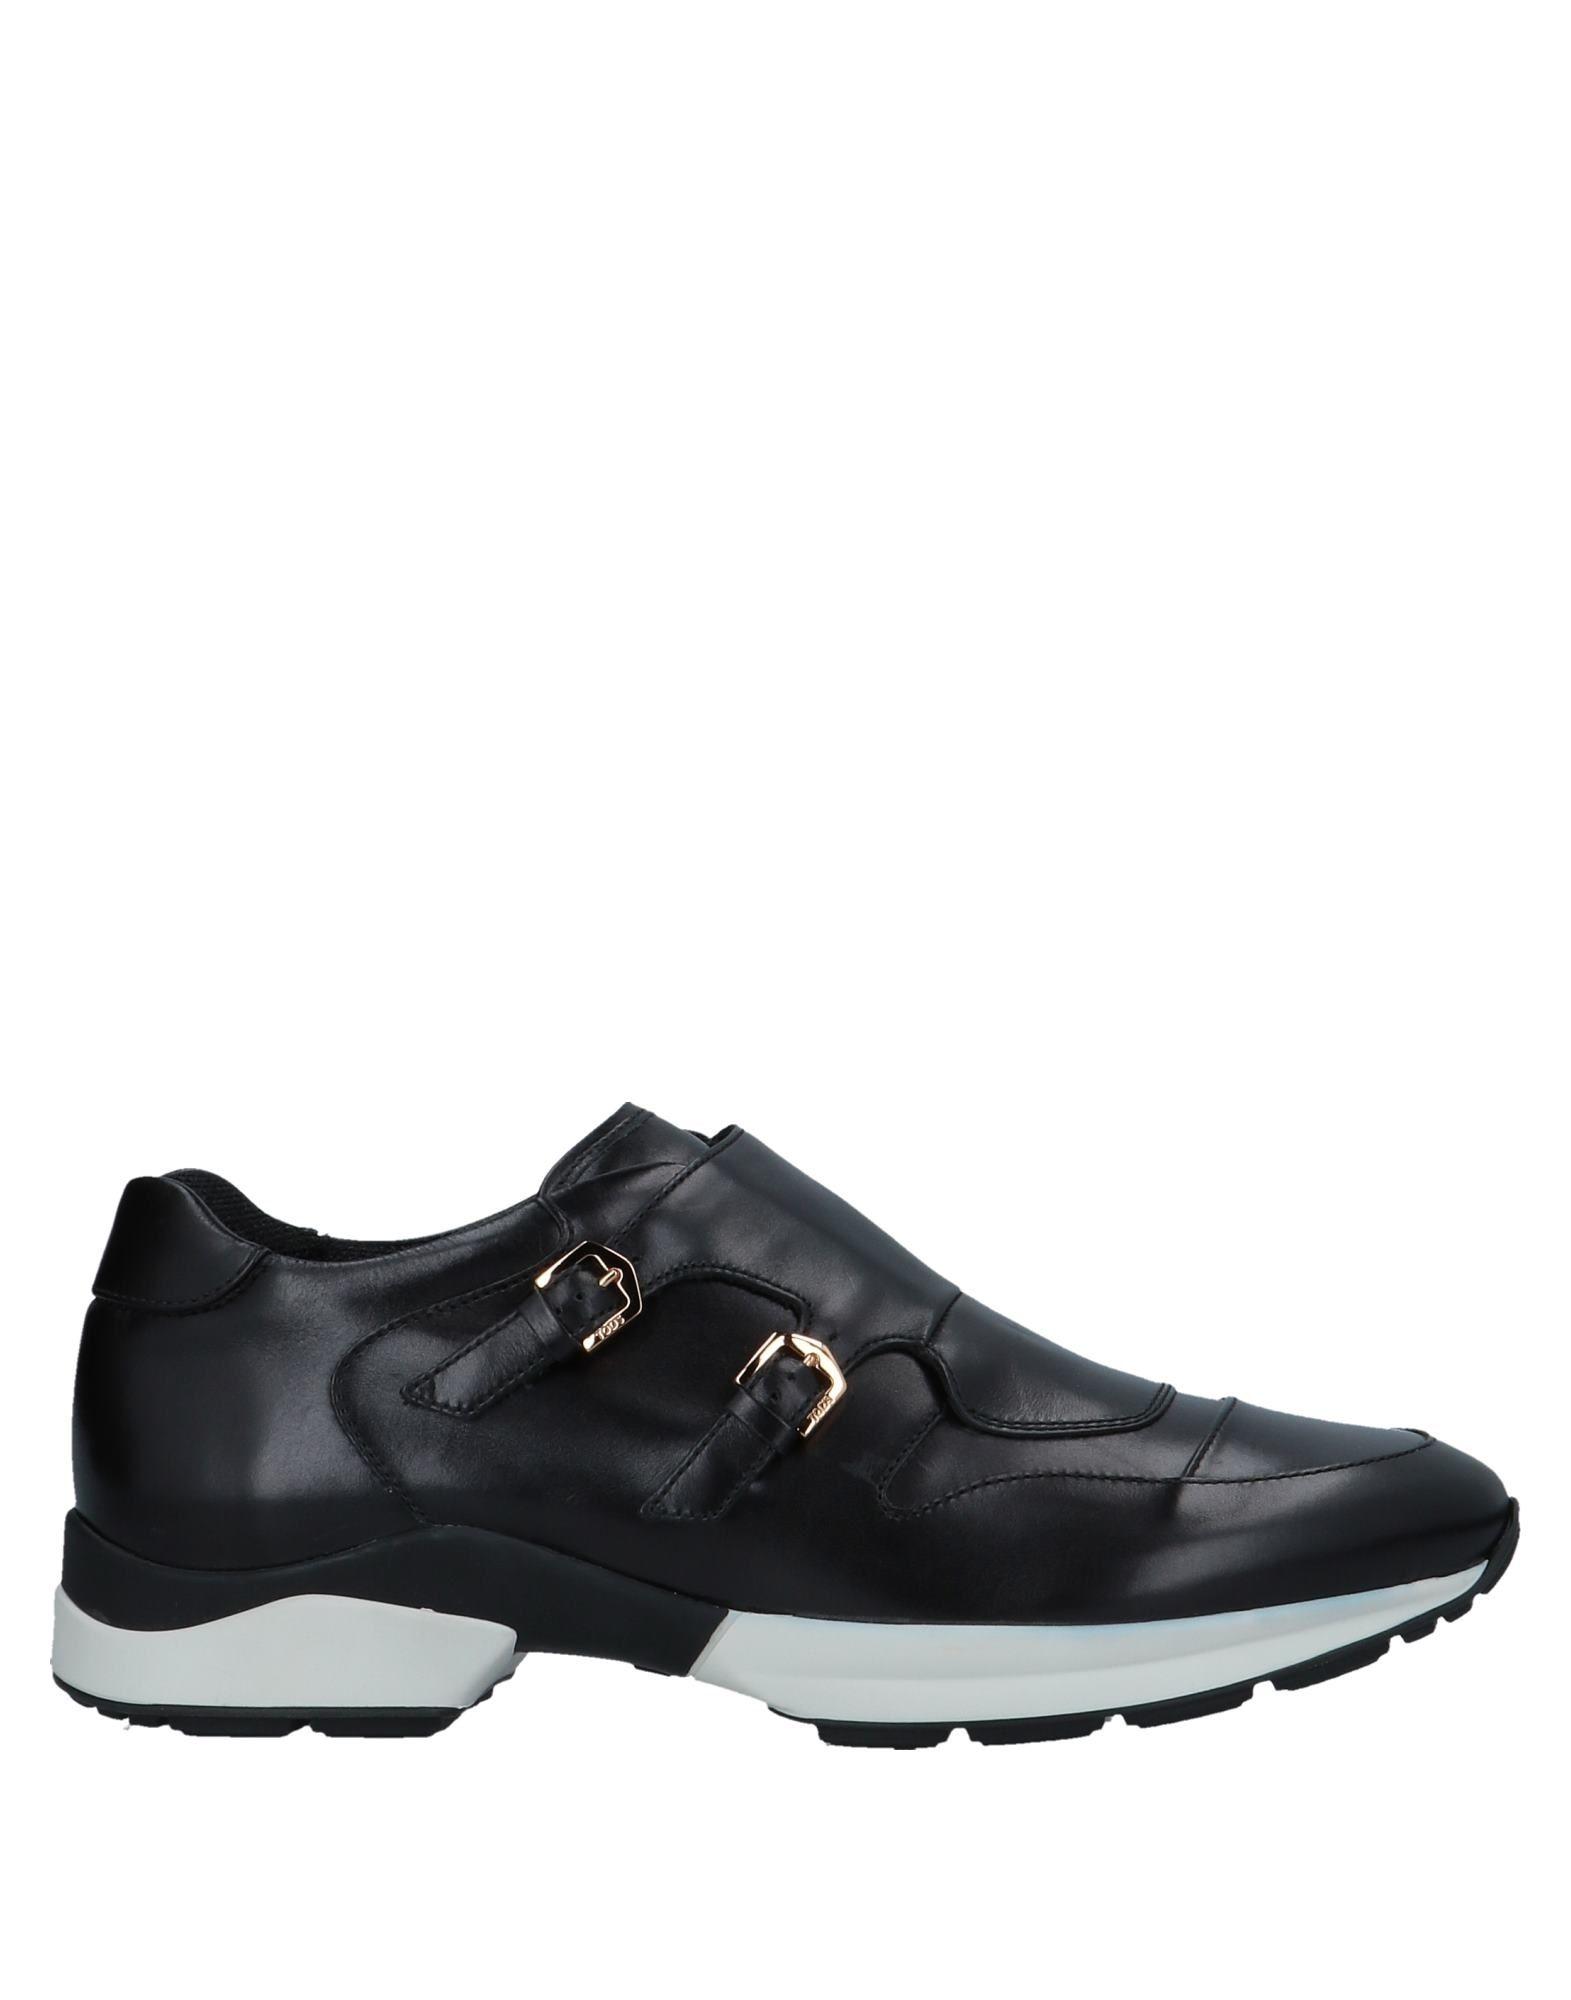 Rabatt Schuhe Tod's Damen Sneakers Damen Tod's  11542140XD 689264